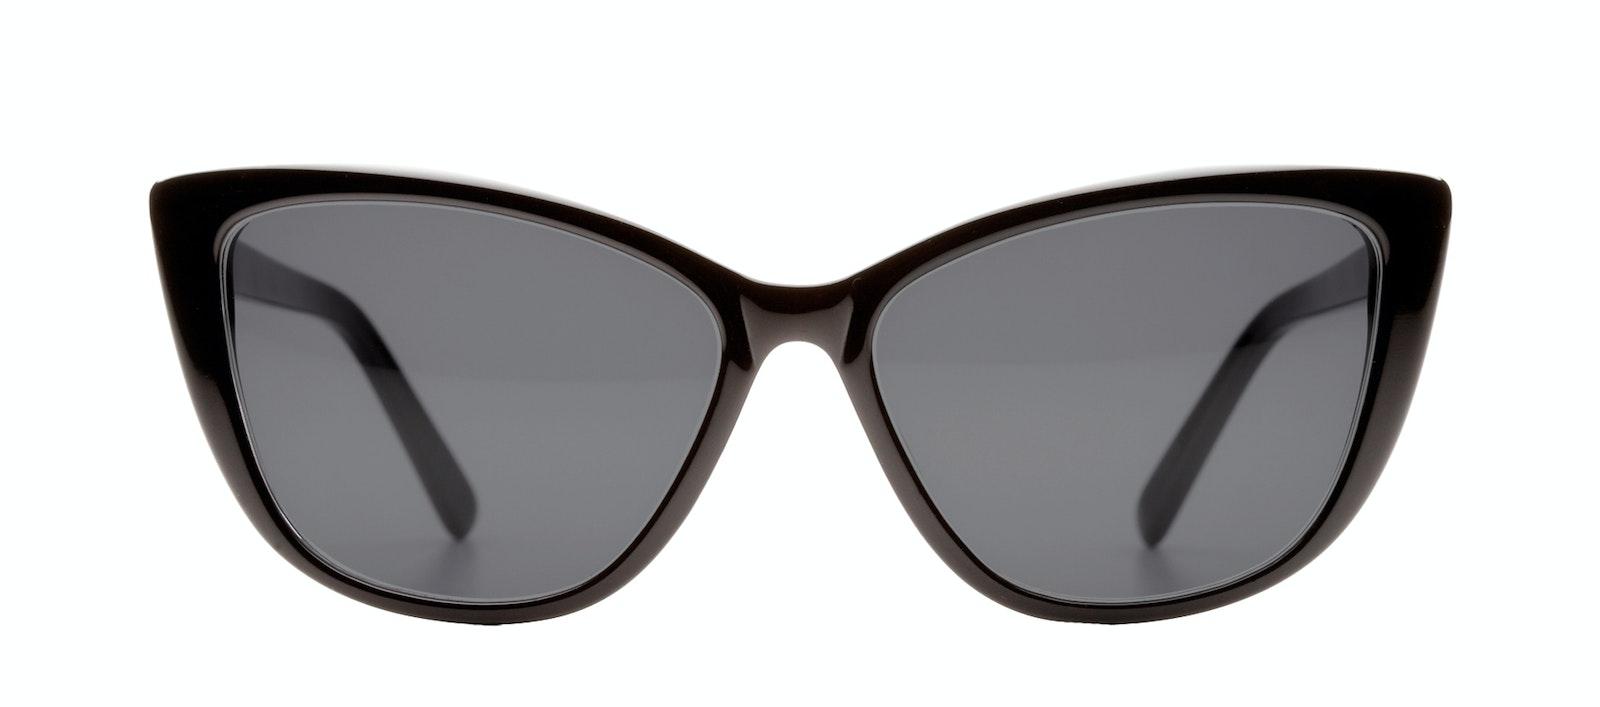 0f4f5da60f38 Affordable Fashion Glasses Cat Eye Daring Cateye Sunglasses Women Dolled Up  Black Front